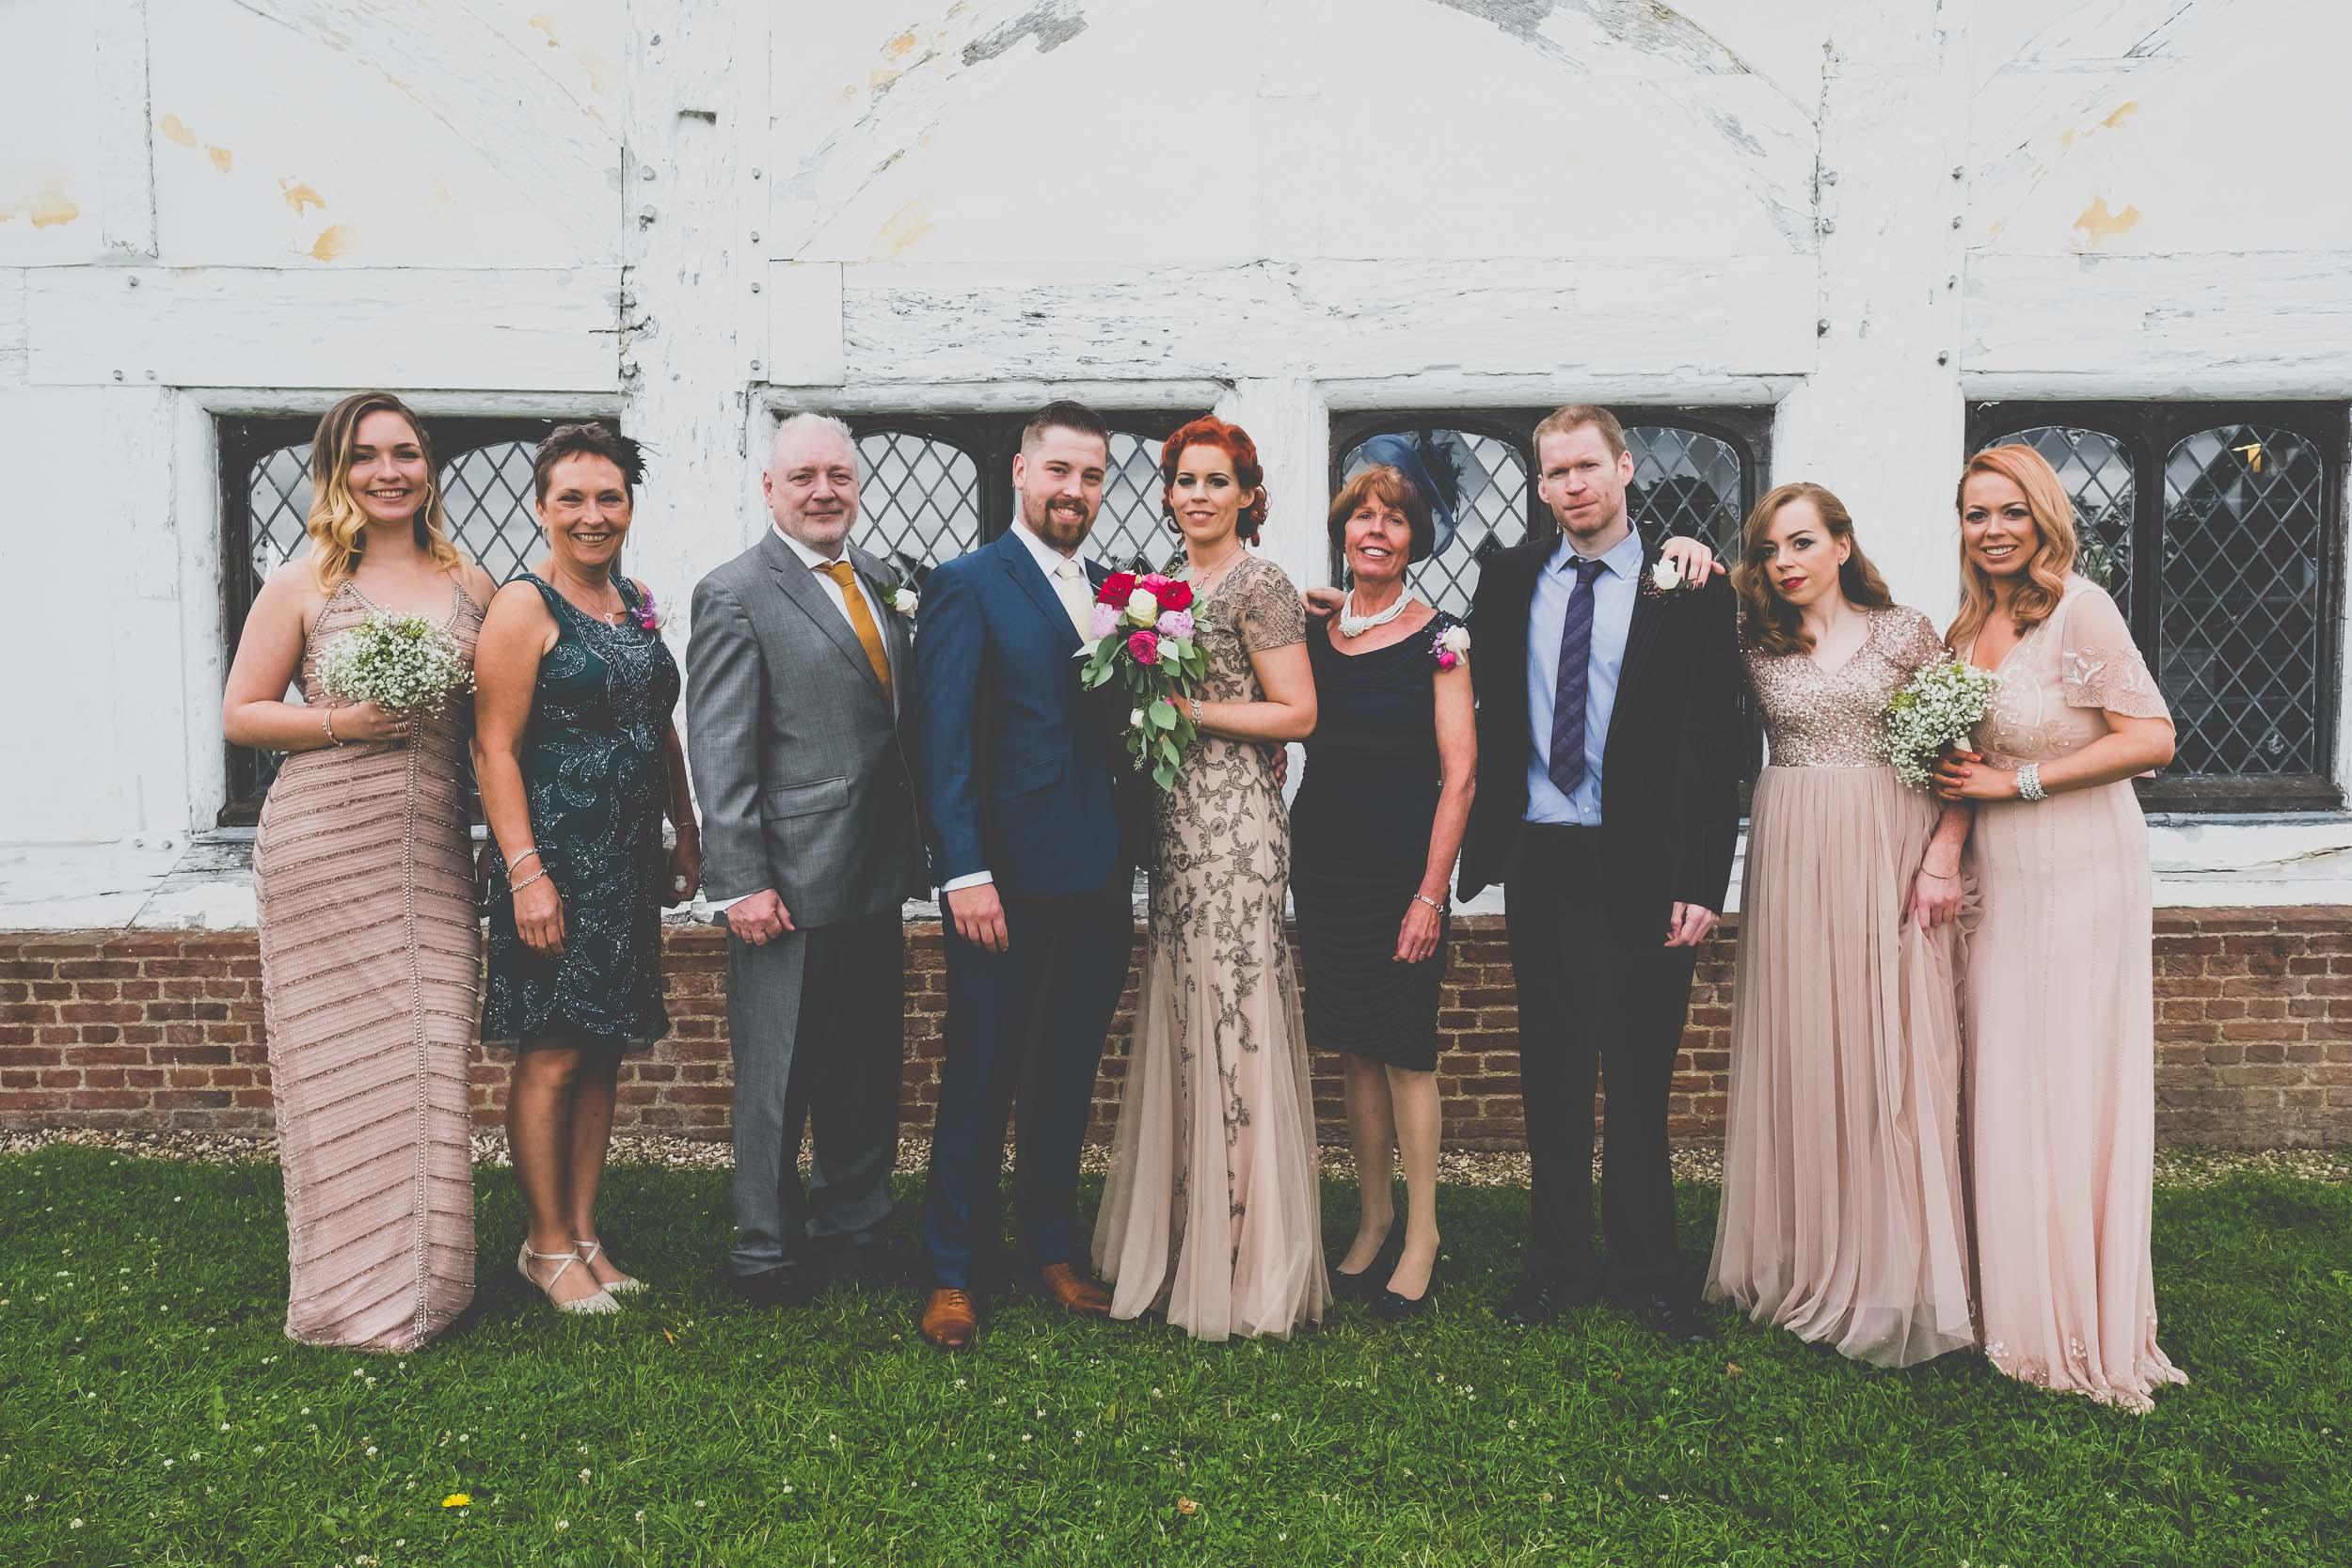 queen-elizabeths-hunting-lodge-epping-forest-wedding168.jpg